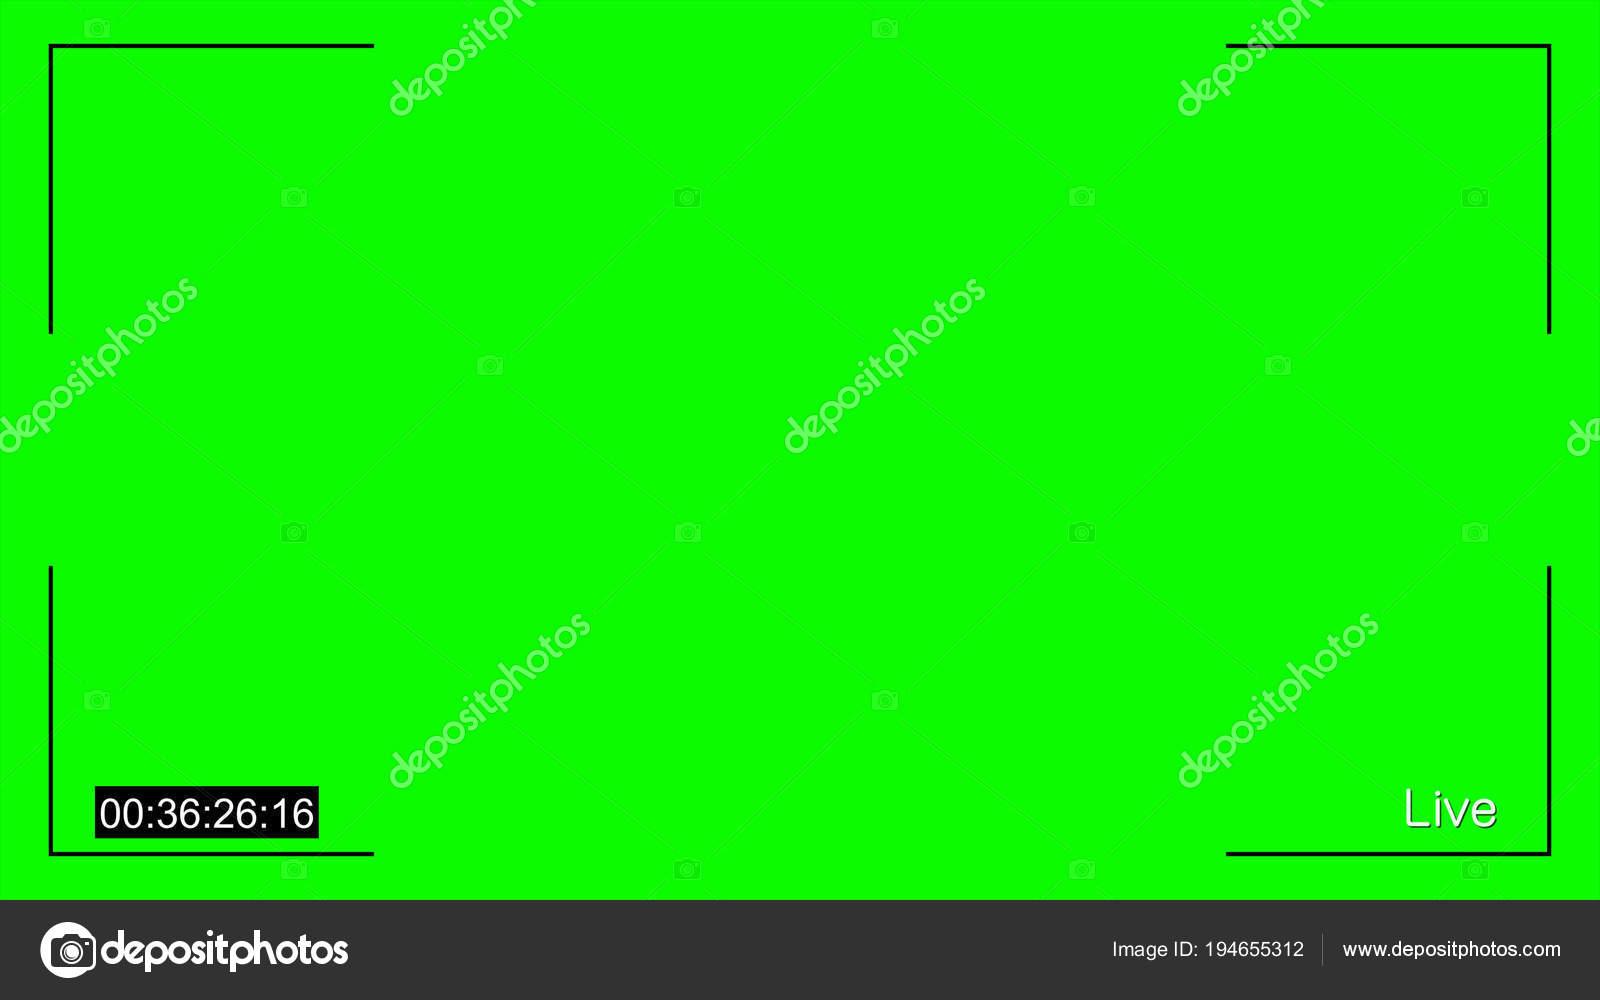 CCTV Live e timecode croma — Stock Photo © realcg #194655312